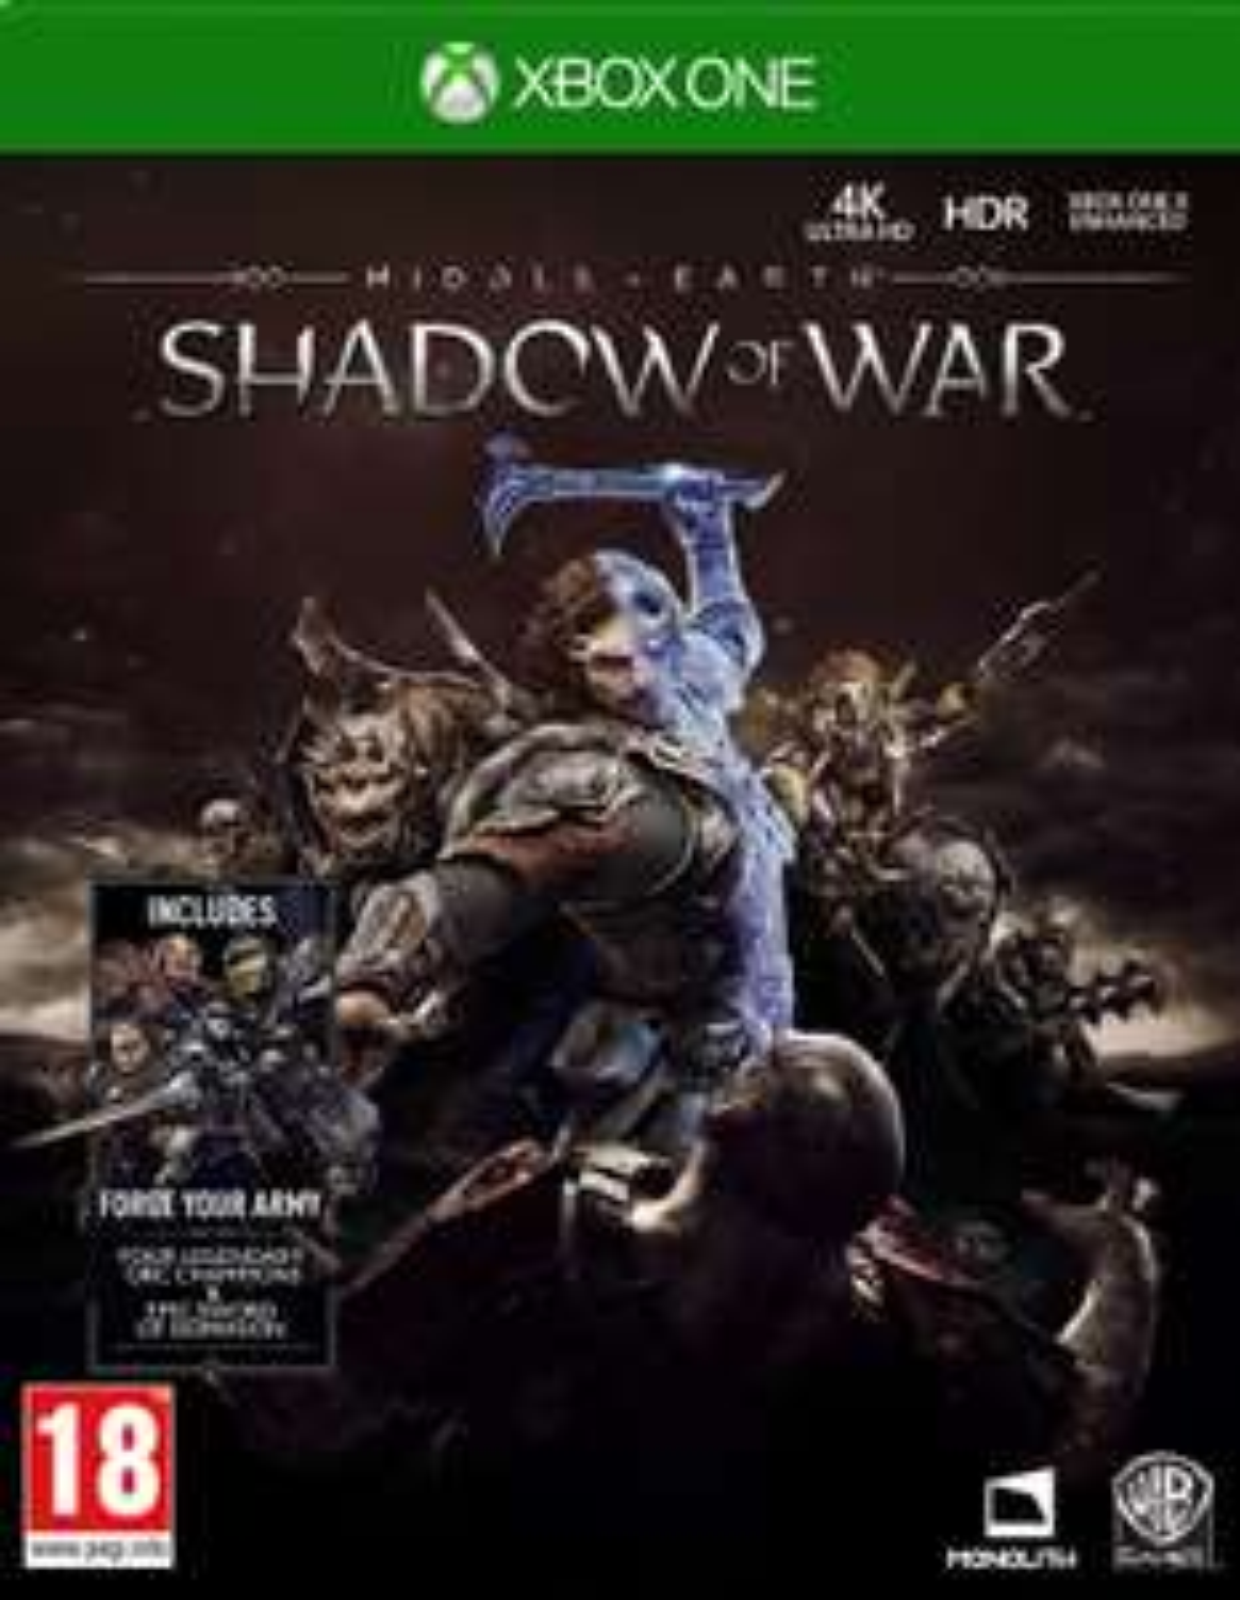 Middle Earth: Shadow of War Inc Champion & Sword DLC [XBox] £9.85 @ ShopTo